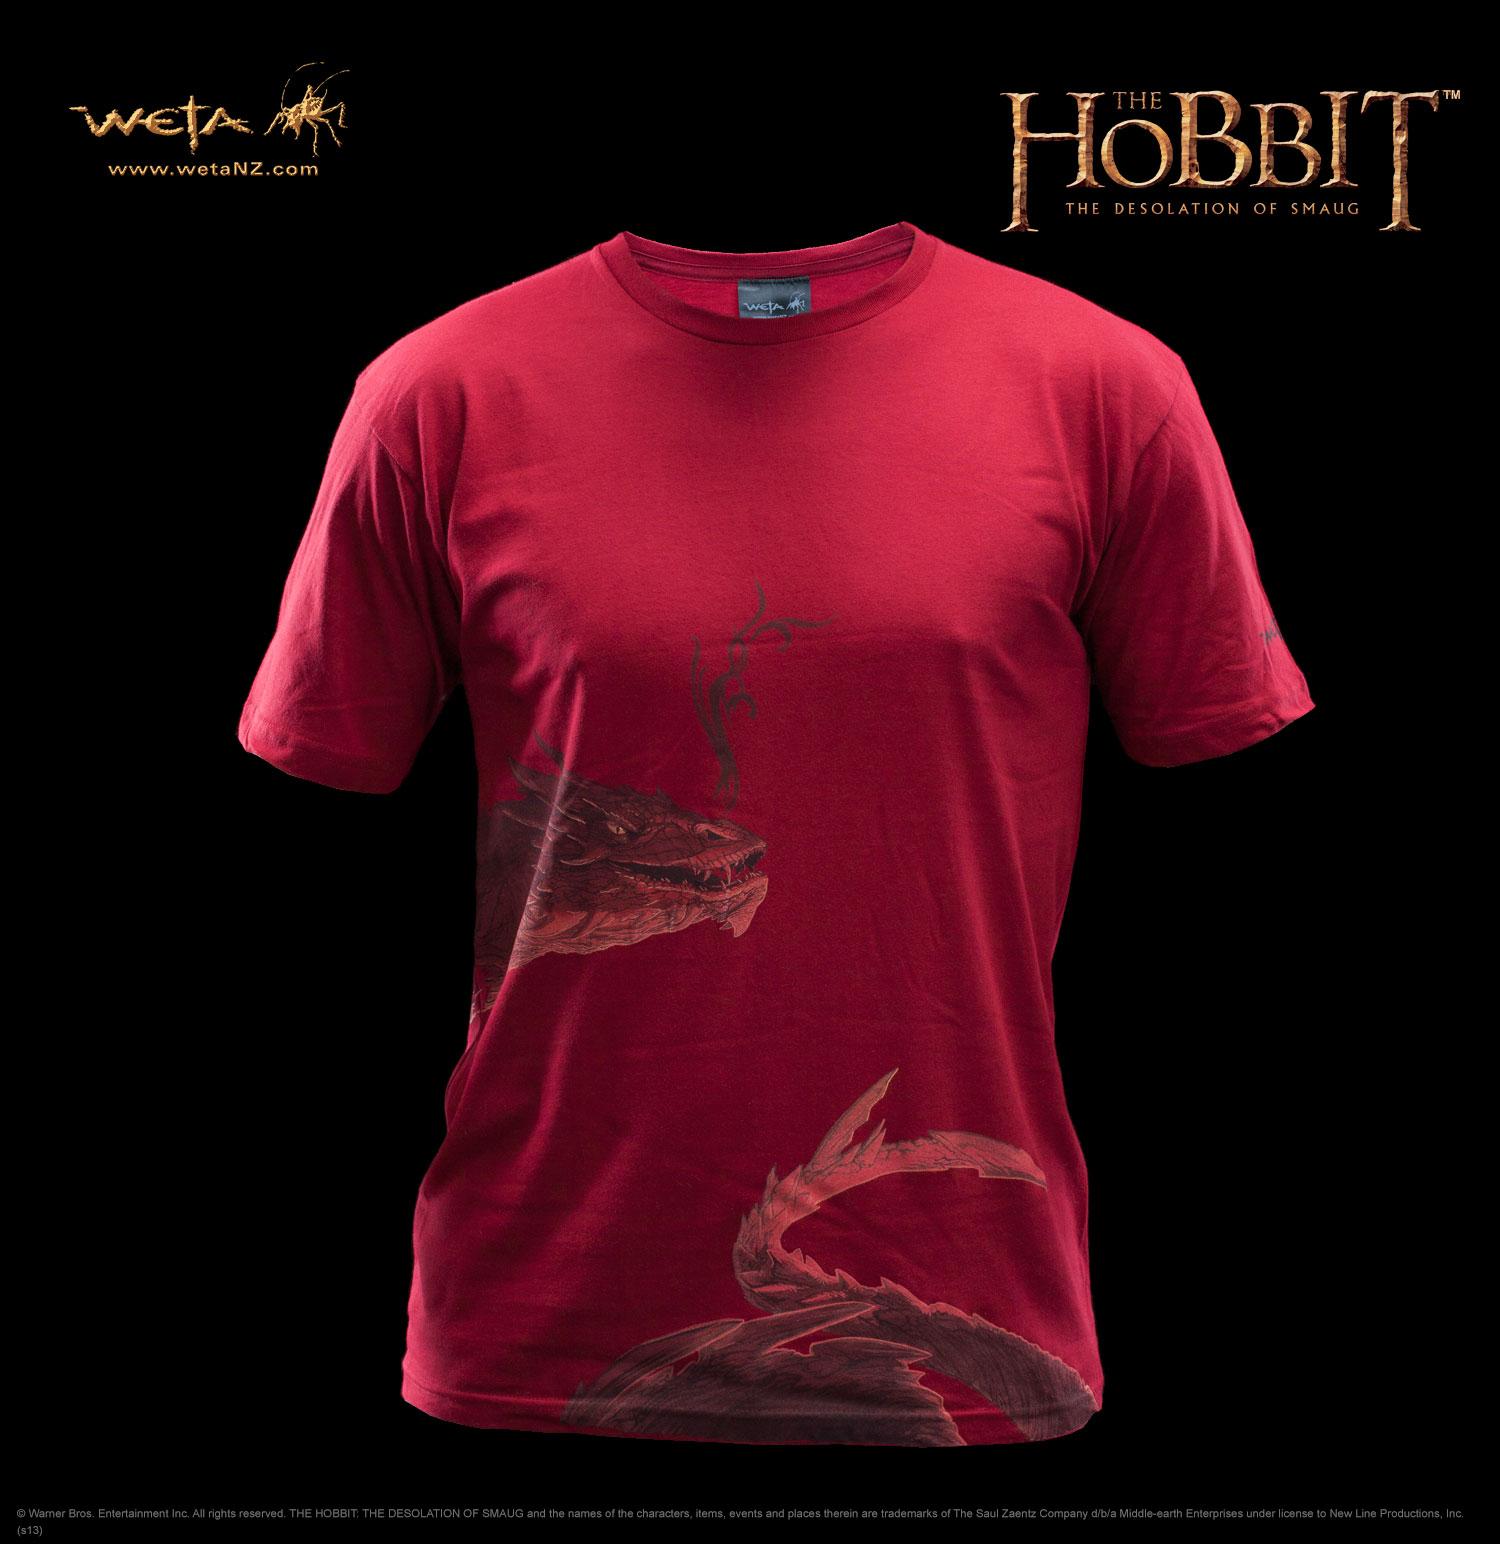 Hobbittshirtsmaugwraparoundalrg2